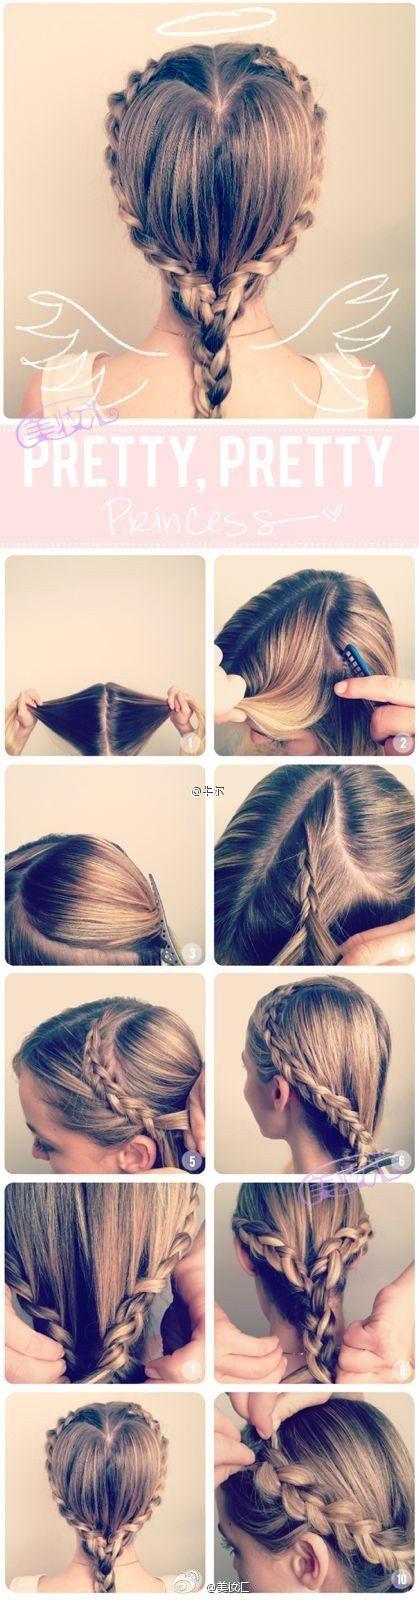 Pretty: French Braids, Braids Hairstyles, Heart Braids, Hair Tutorials, Heartbraid, Beautiful, Hair Style, Flower Girls, Girls Hair